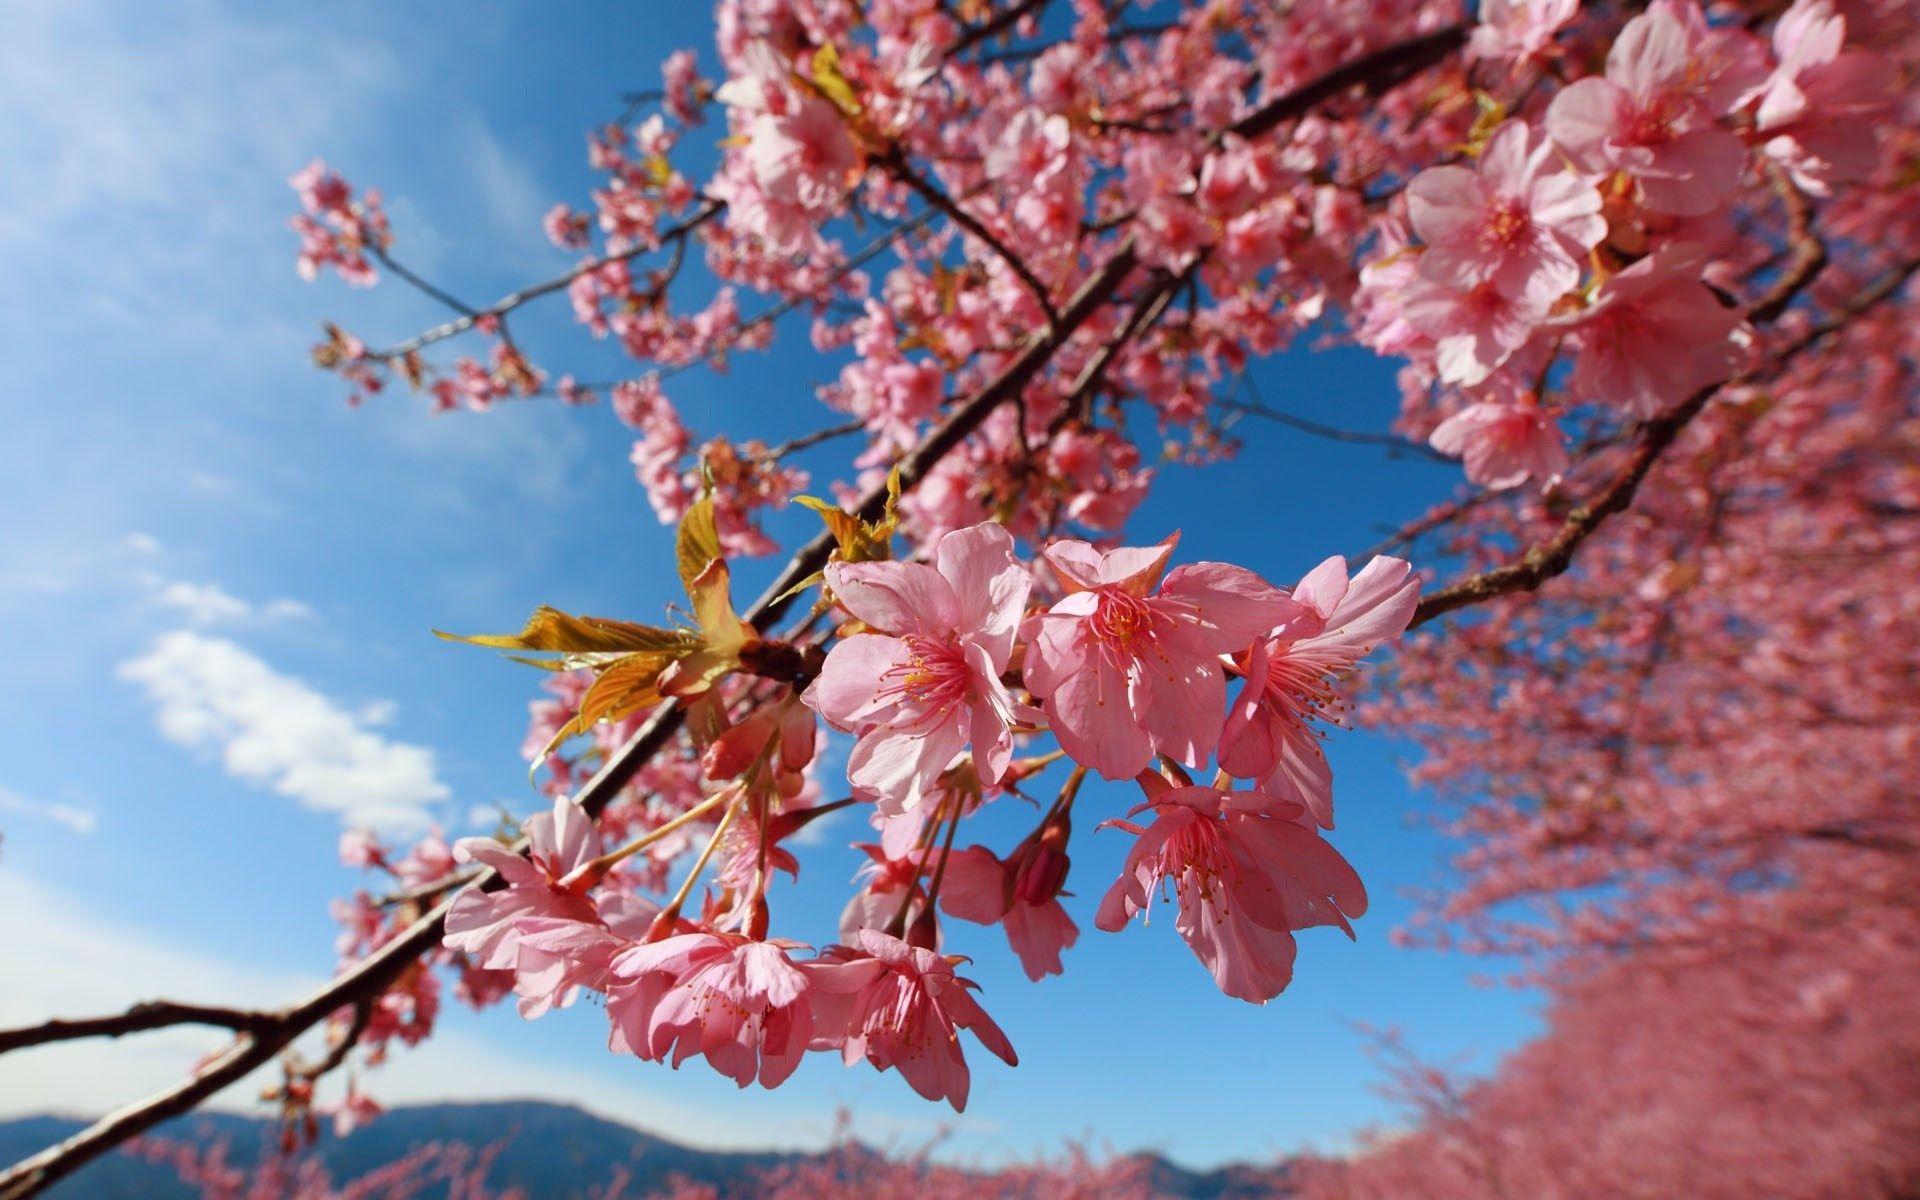 Cherry Blossom Festival San Diego County March 2017 Cherry Blossom Festival Cherry Blossom Blossom